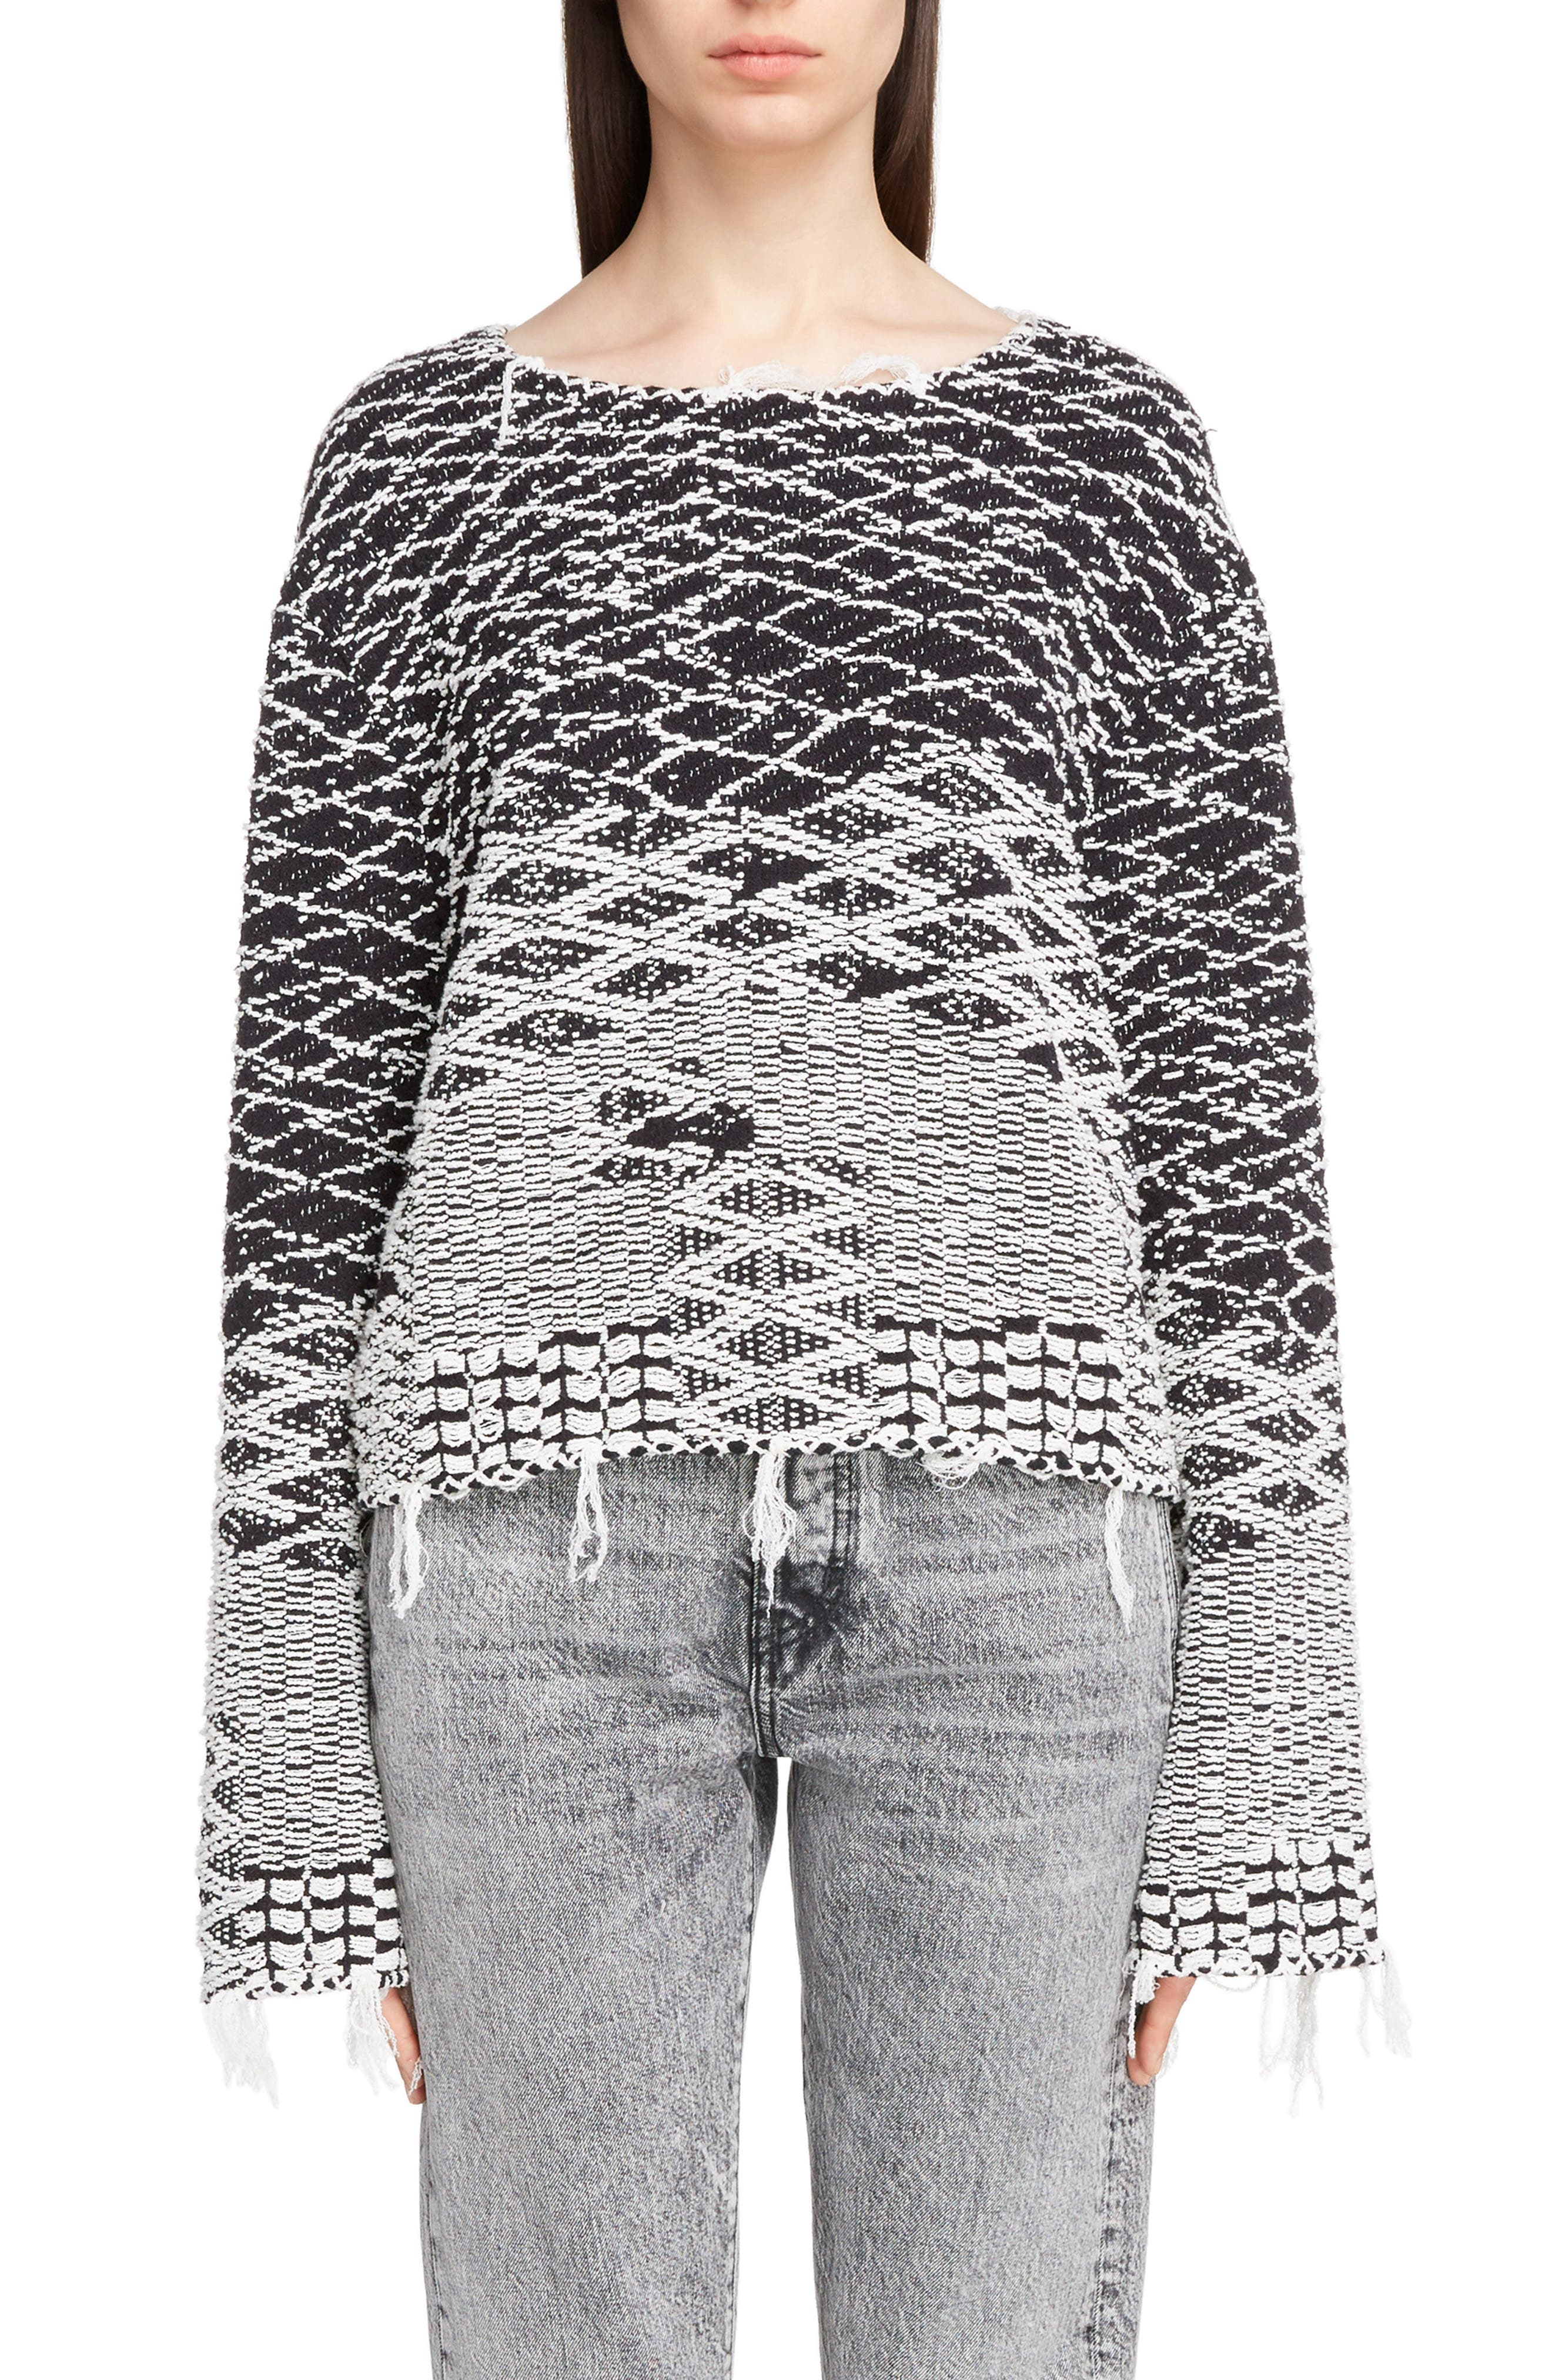 Saint Laurent Fringe Jacquard Sweater